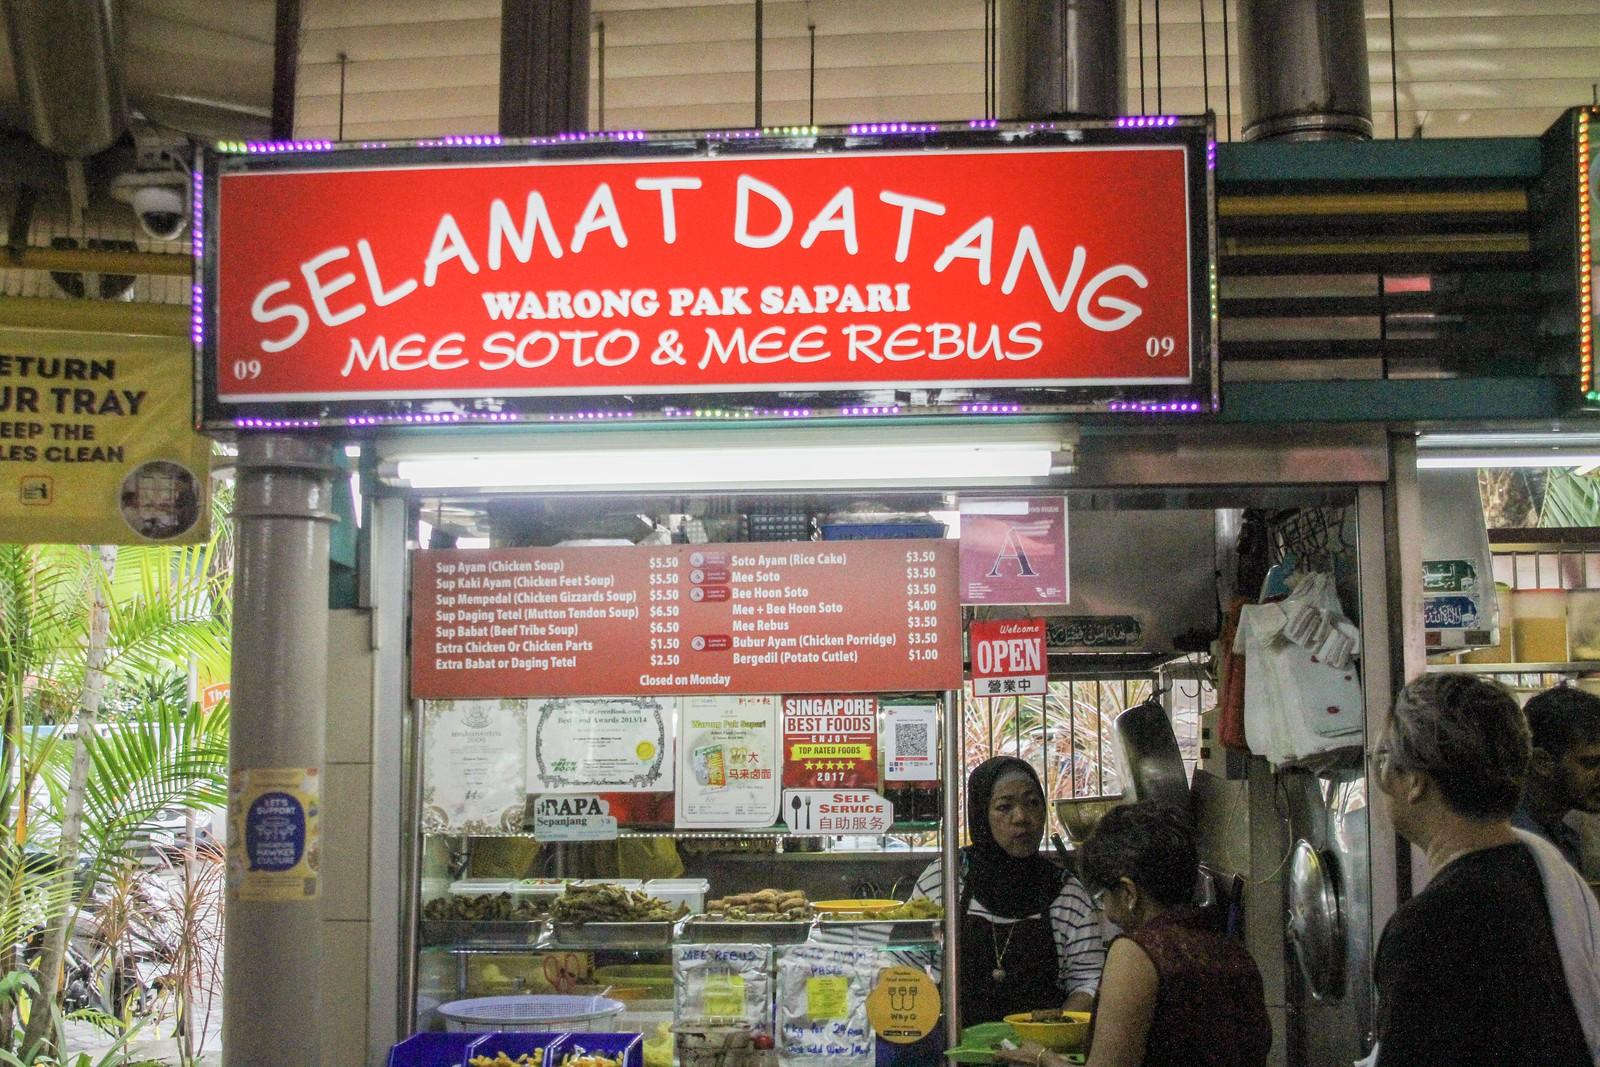 Adam Road Food Centre - Warong Pak Sapari